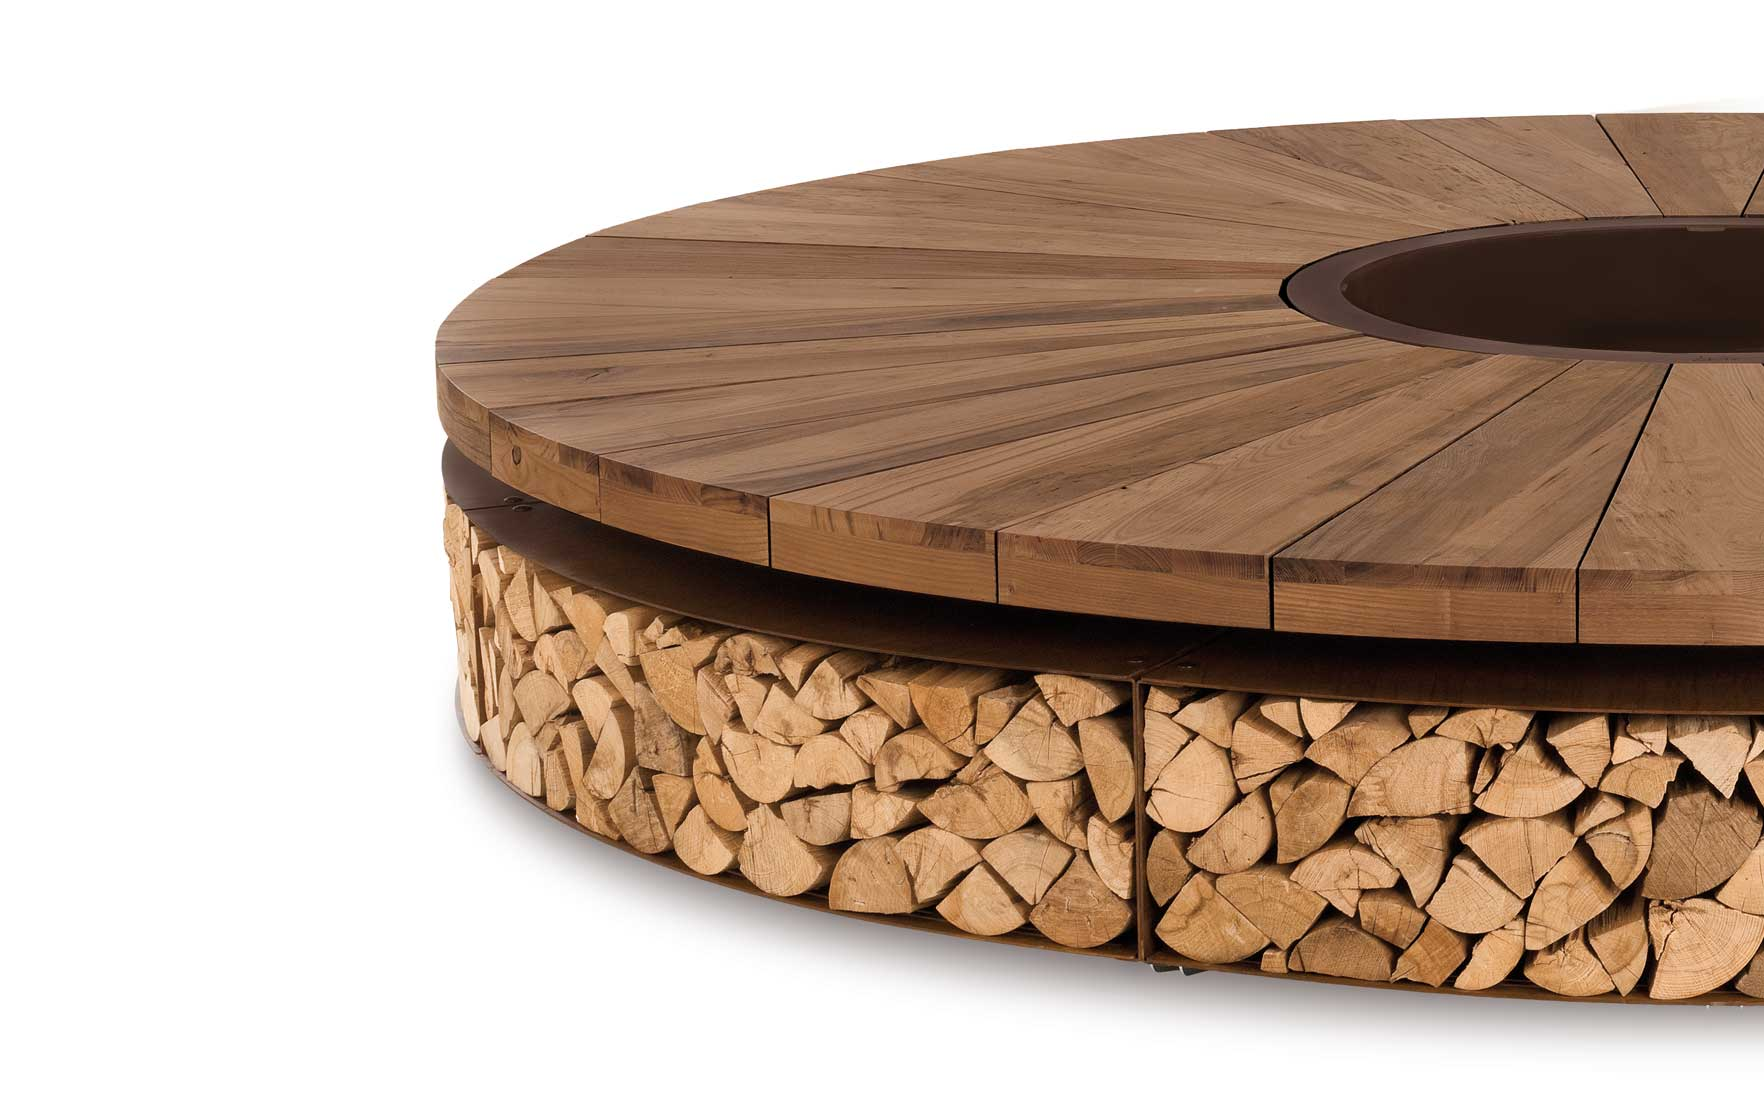 Artu' Wood-Burning Fire Pit